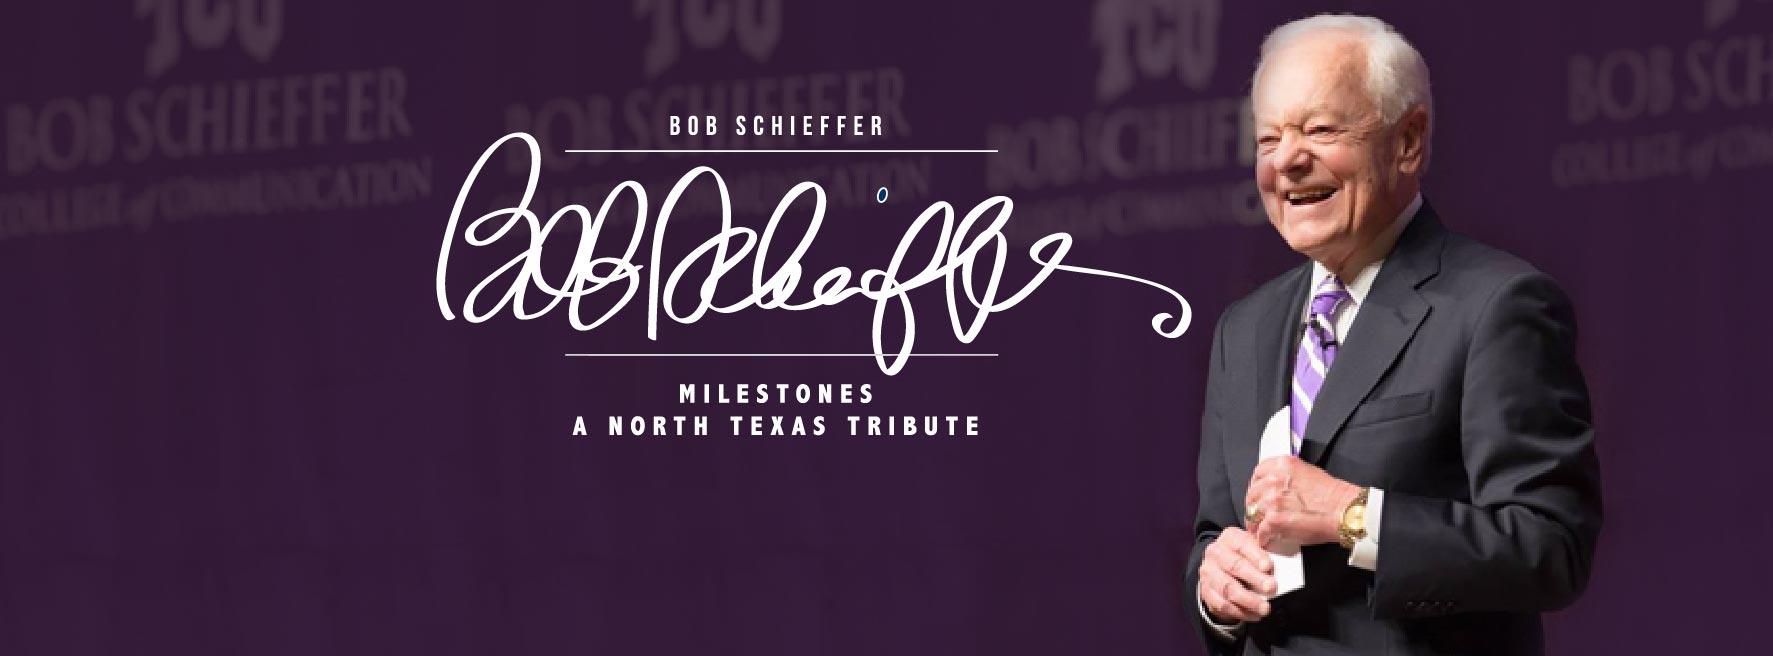 Bob_Schieffer_BANNER-01